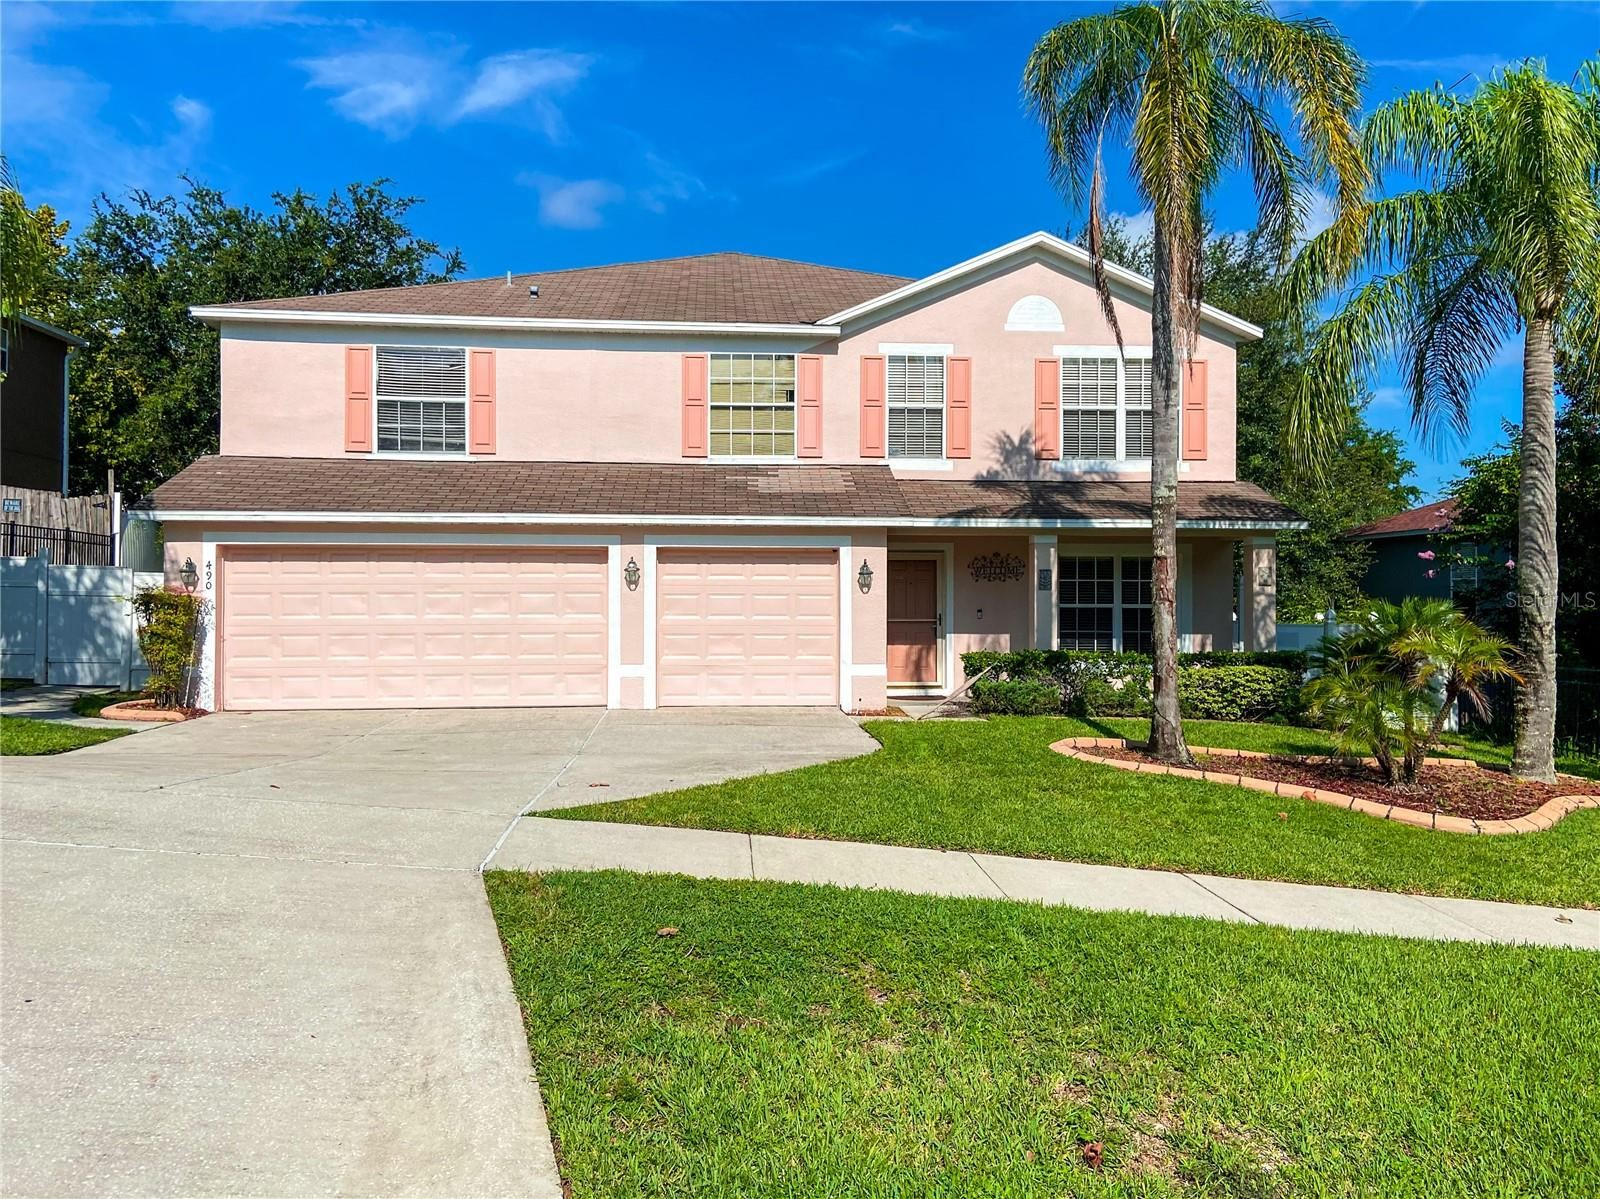 490 SOUTHRIDGE ROAD, Clermont, FL 34711 - #: S5054290